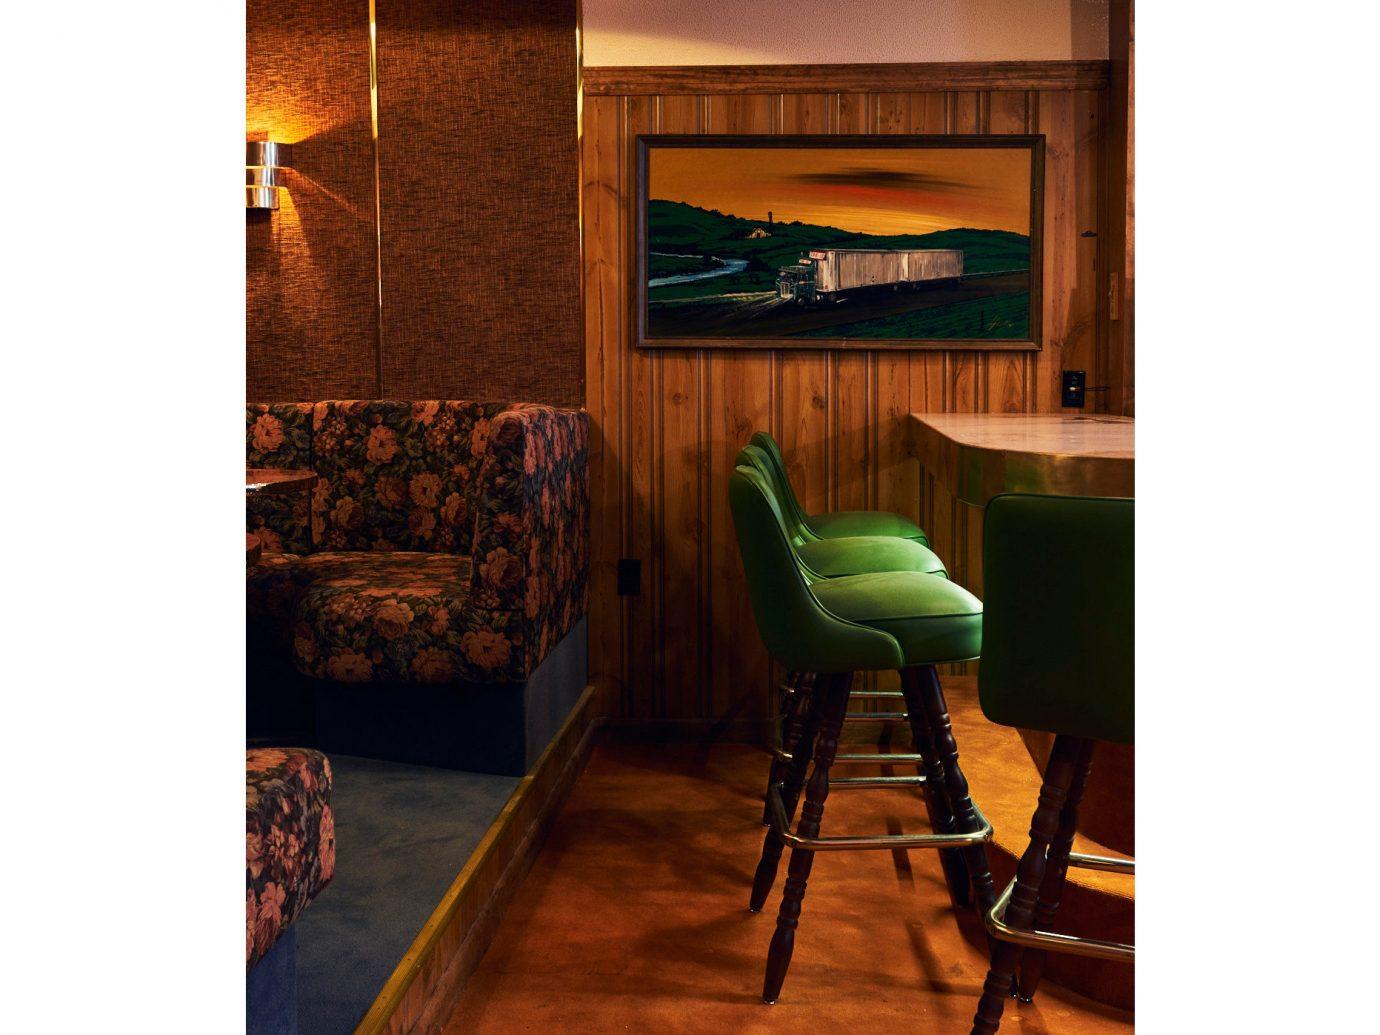 Food + Drink Trip Ideas indoor floor green furniture table room wall interior design chair seat